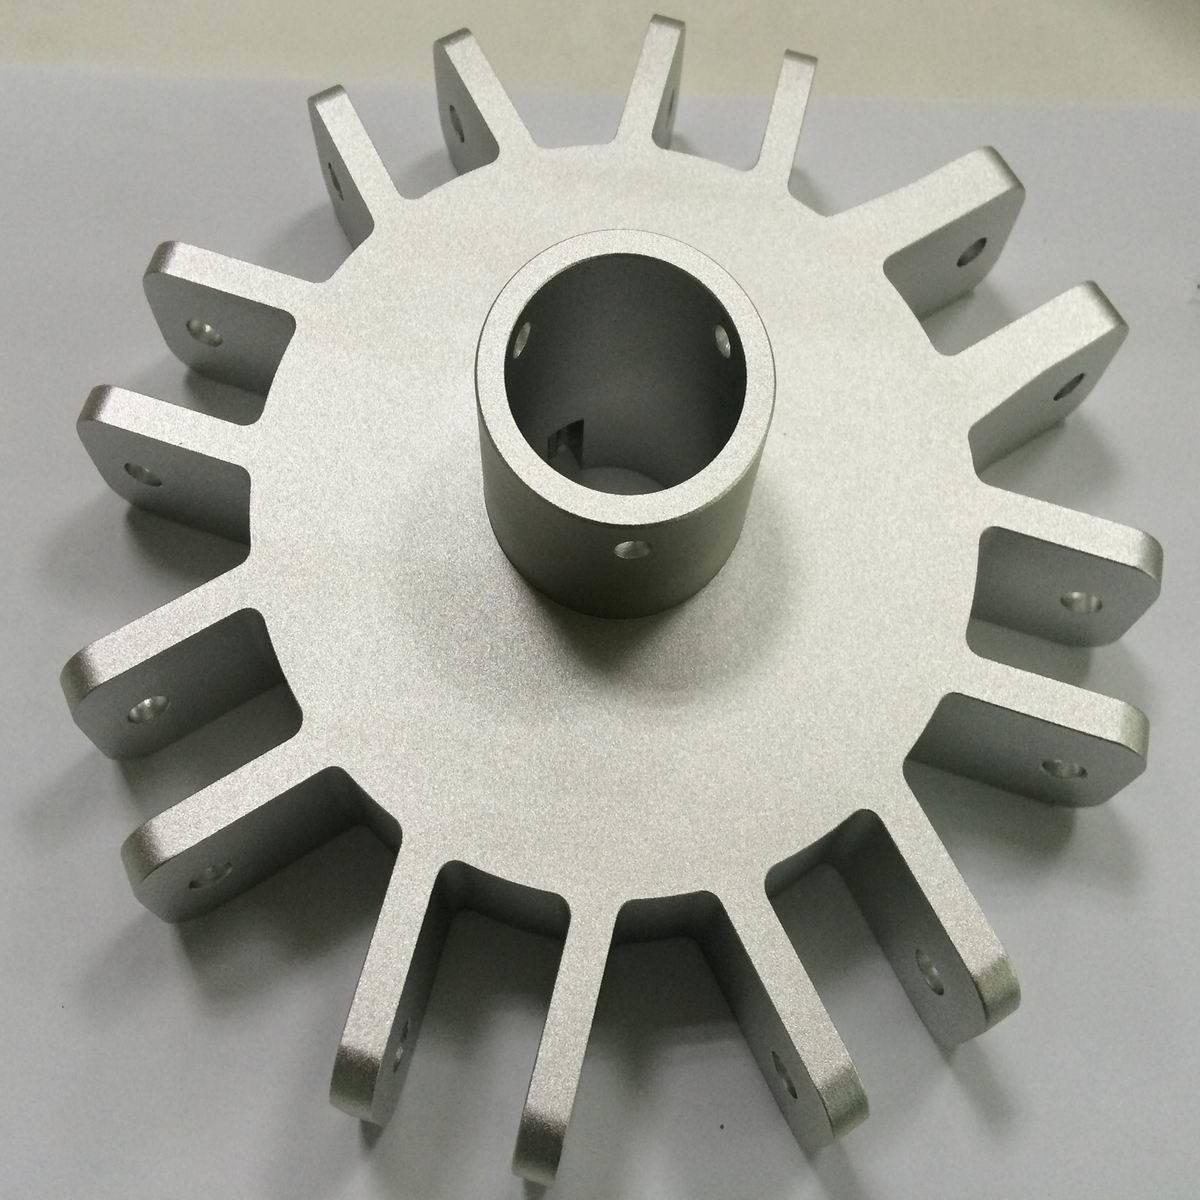 Amercian Customized Design CNC Machining Aluminum Parts for Modern Design Outdoor Rattan Furniture Sun Lounger